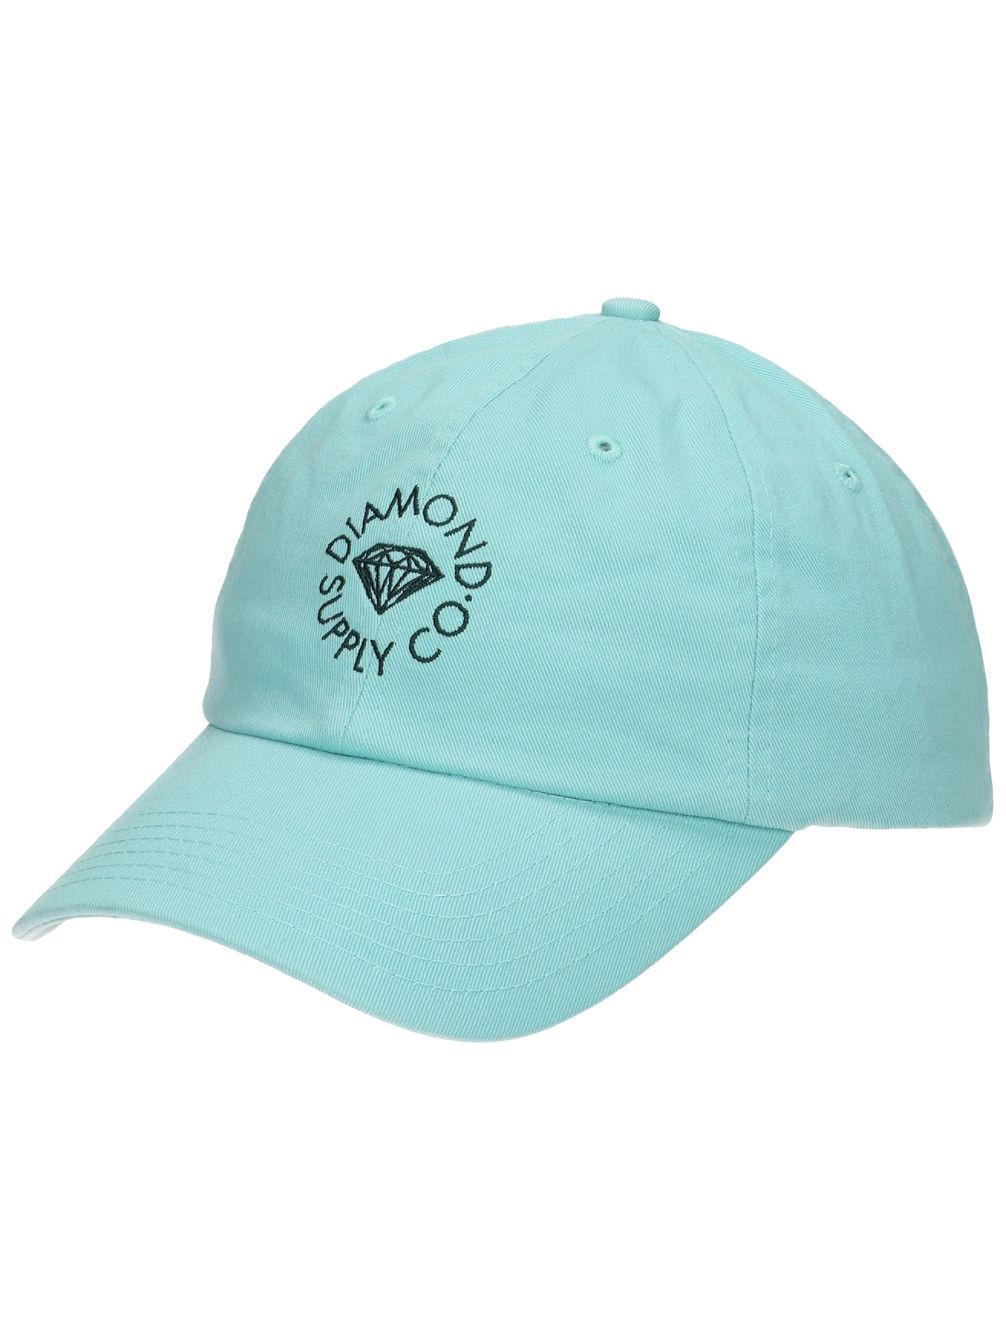 eeb8a3b799663 Buy Diamond Circle Logo Sports Cap online at blue-tomato.com